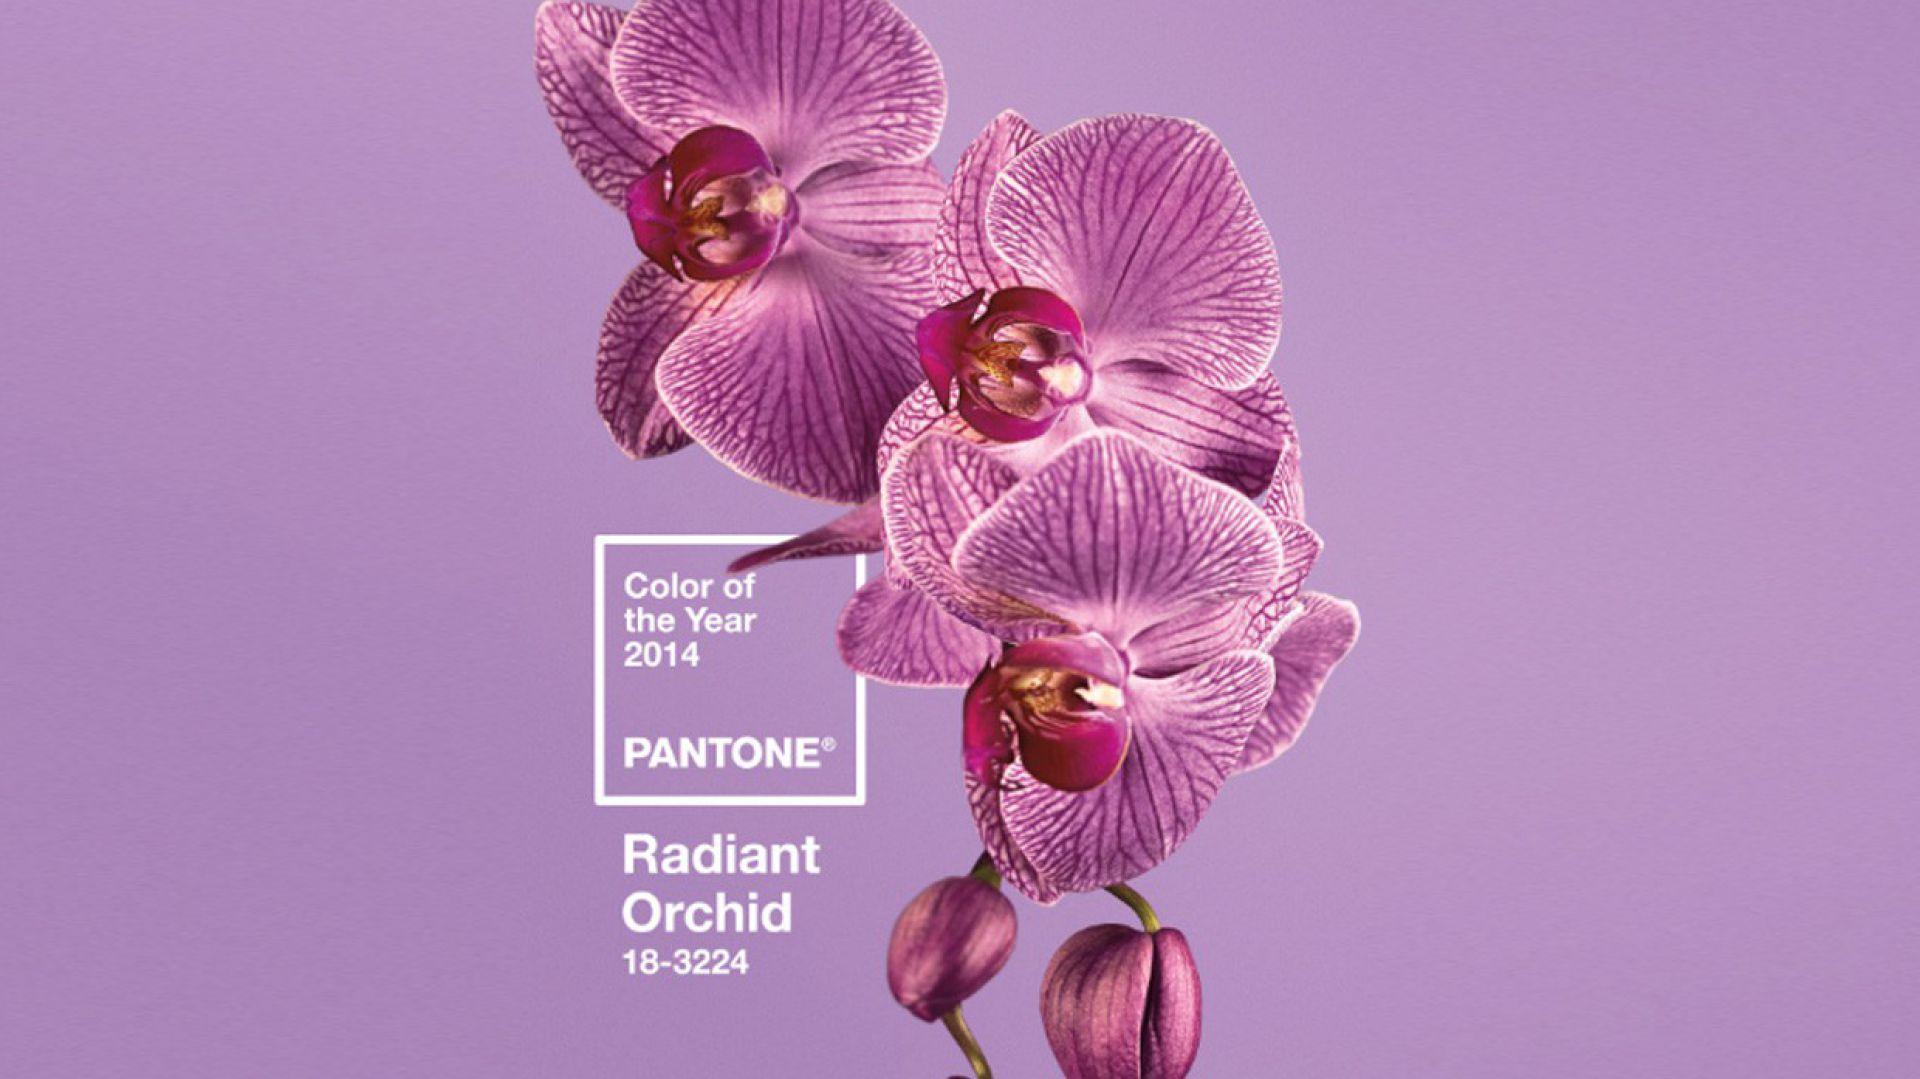 Radiant Orchid. Fot. Instytut Pantone.